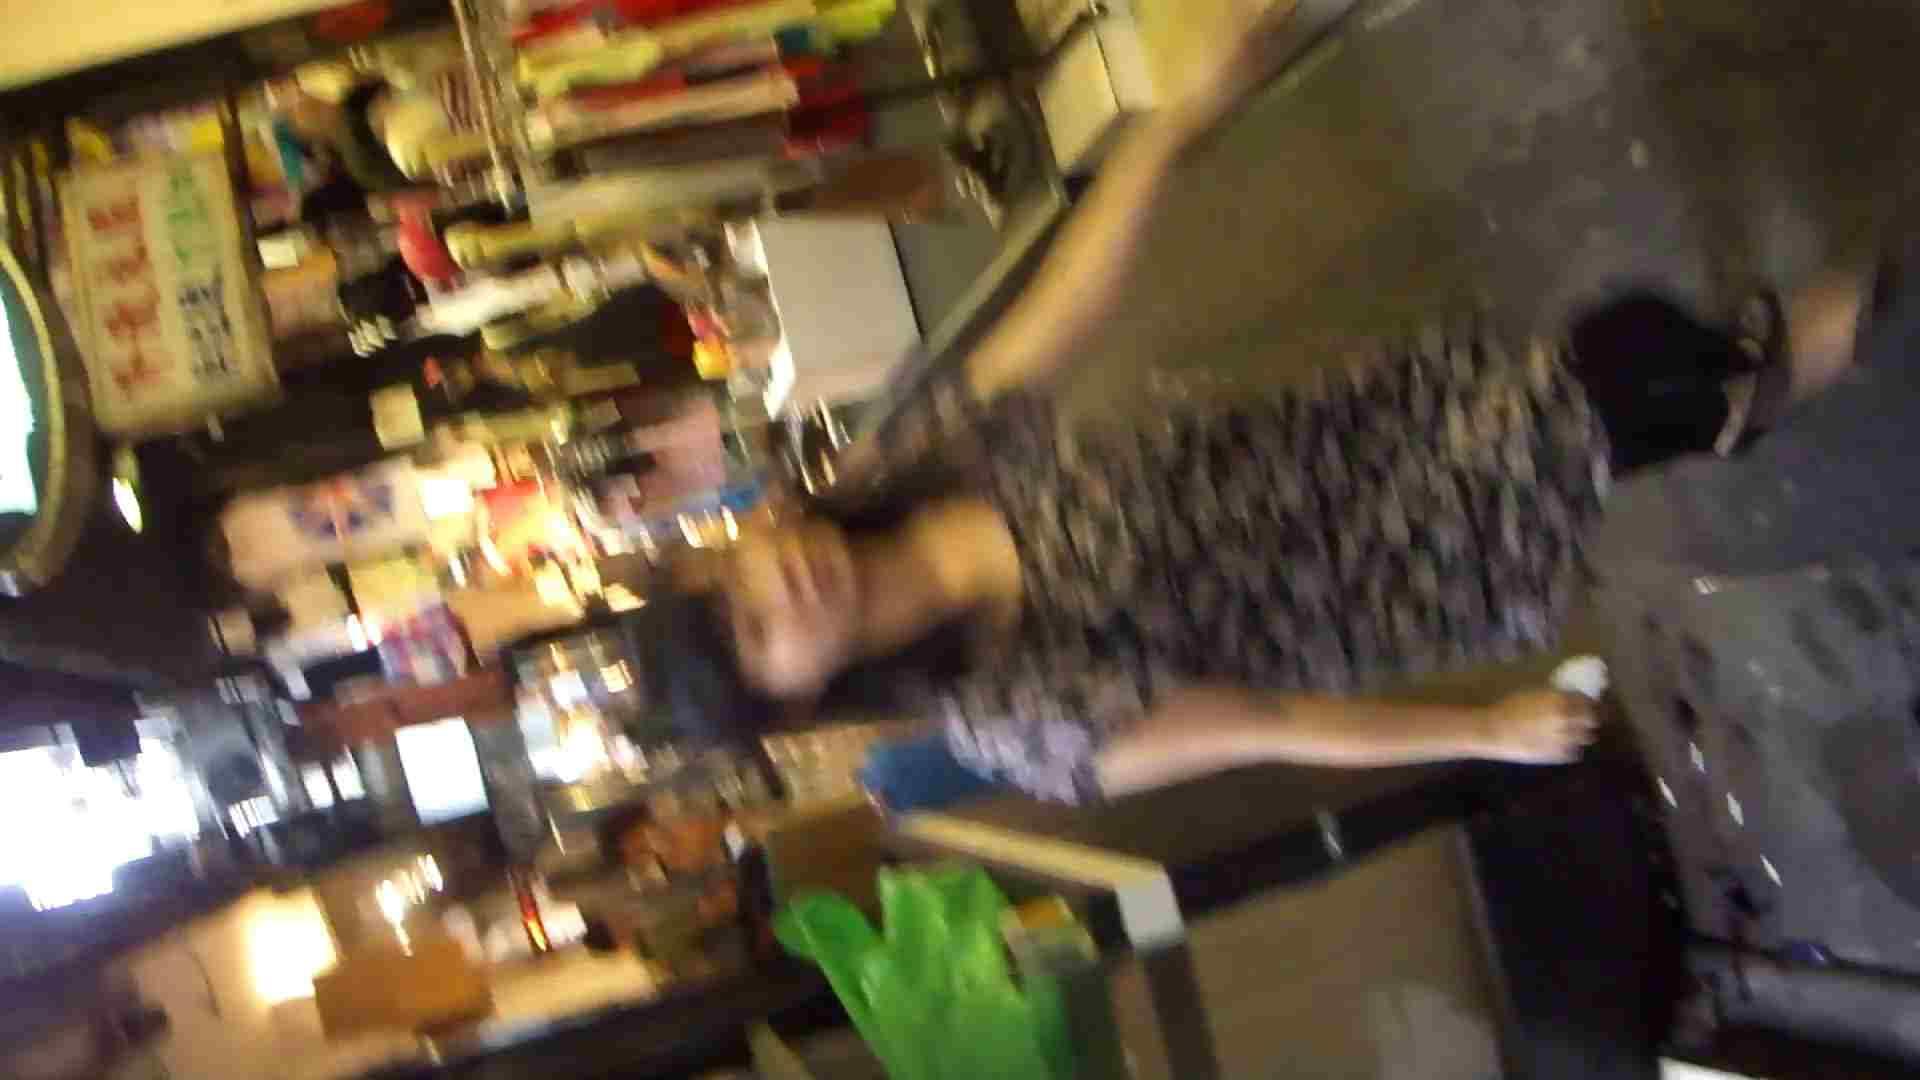 JD盗撮 美女の洗面所の秘密 Vol.76 美肌 オメコ無修正動画無料 99画像 65